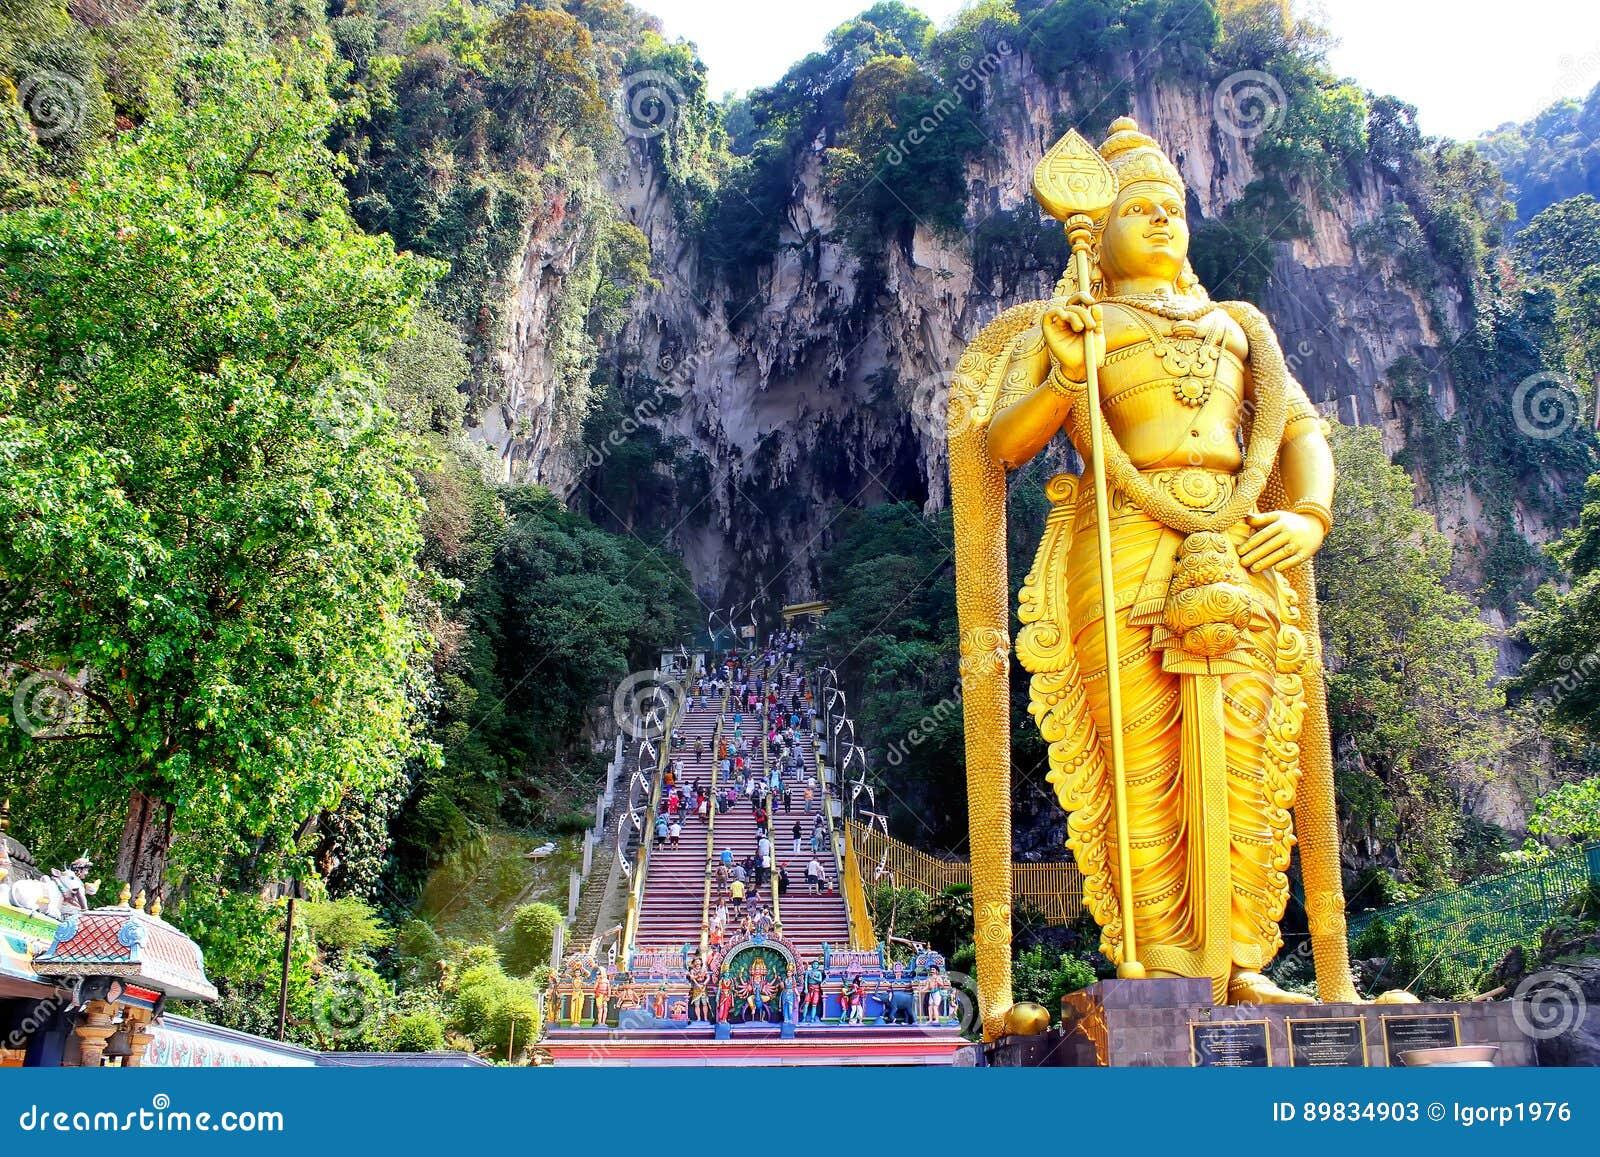 Batu grottor staty och ingång nära Kuala Lumpur, Malaysia